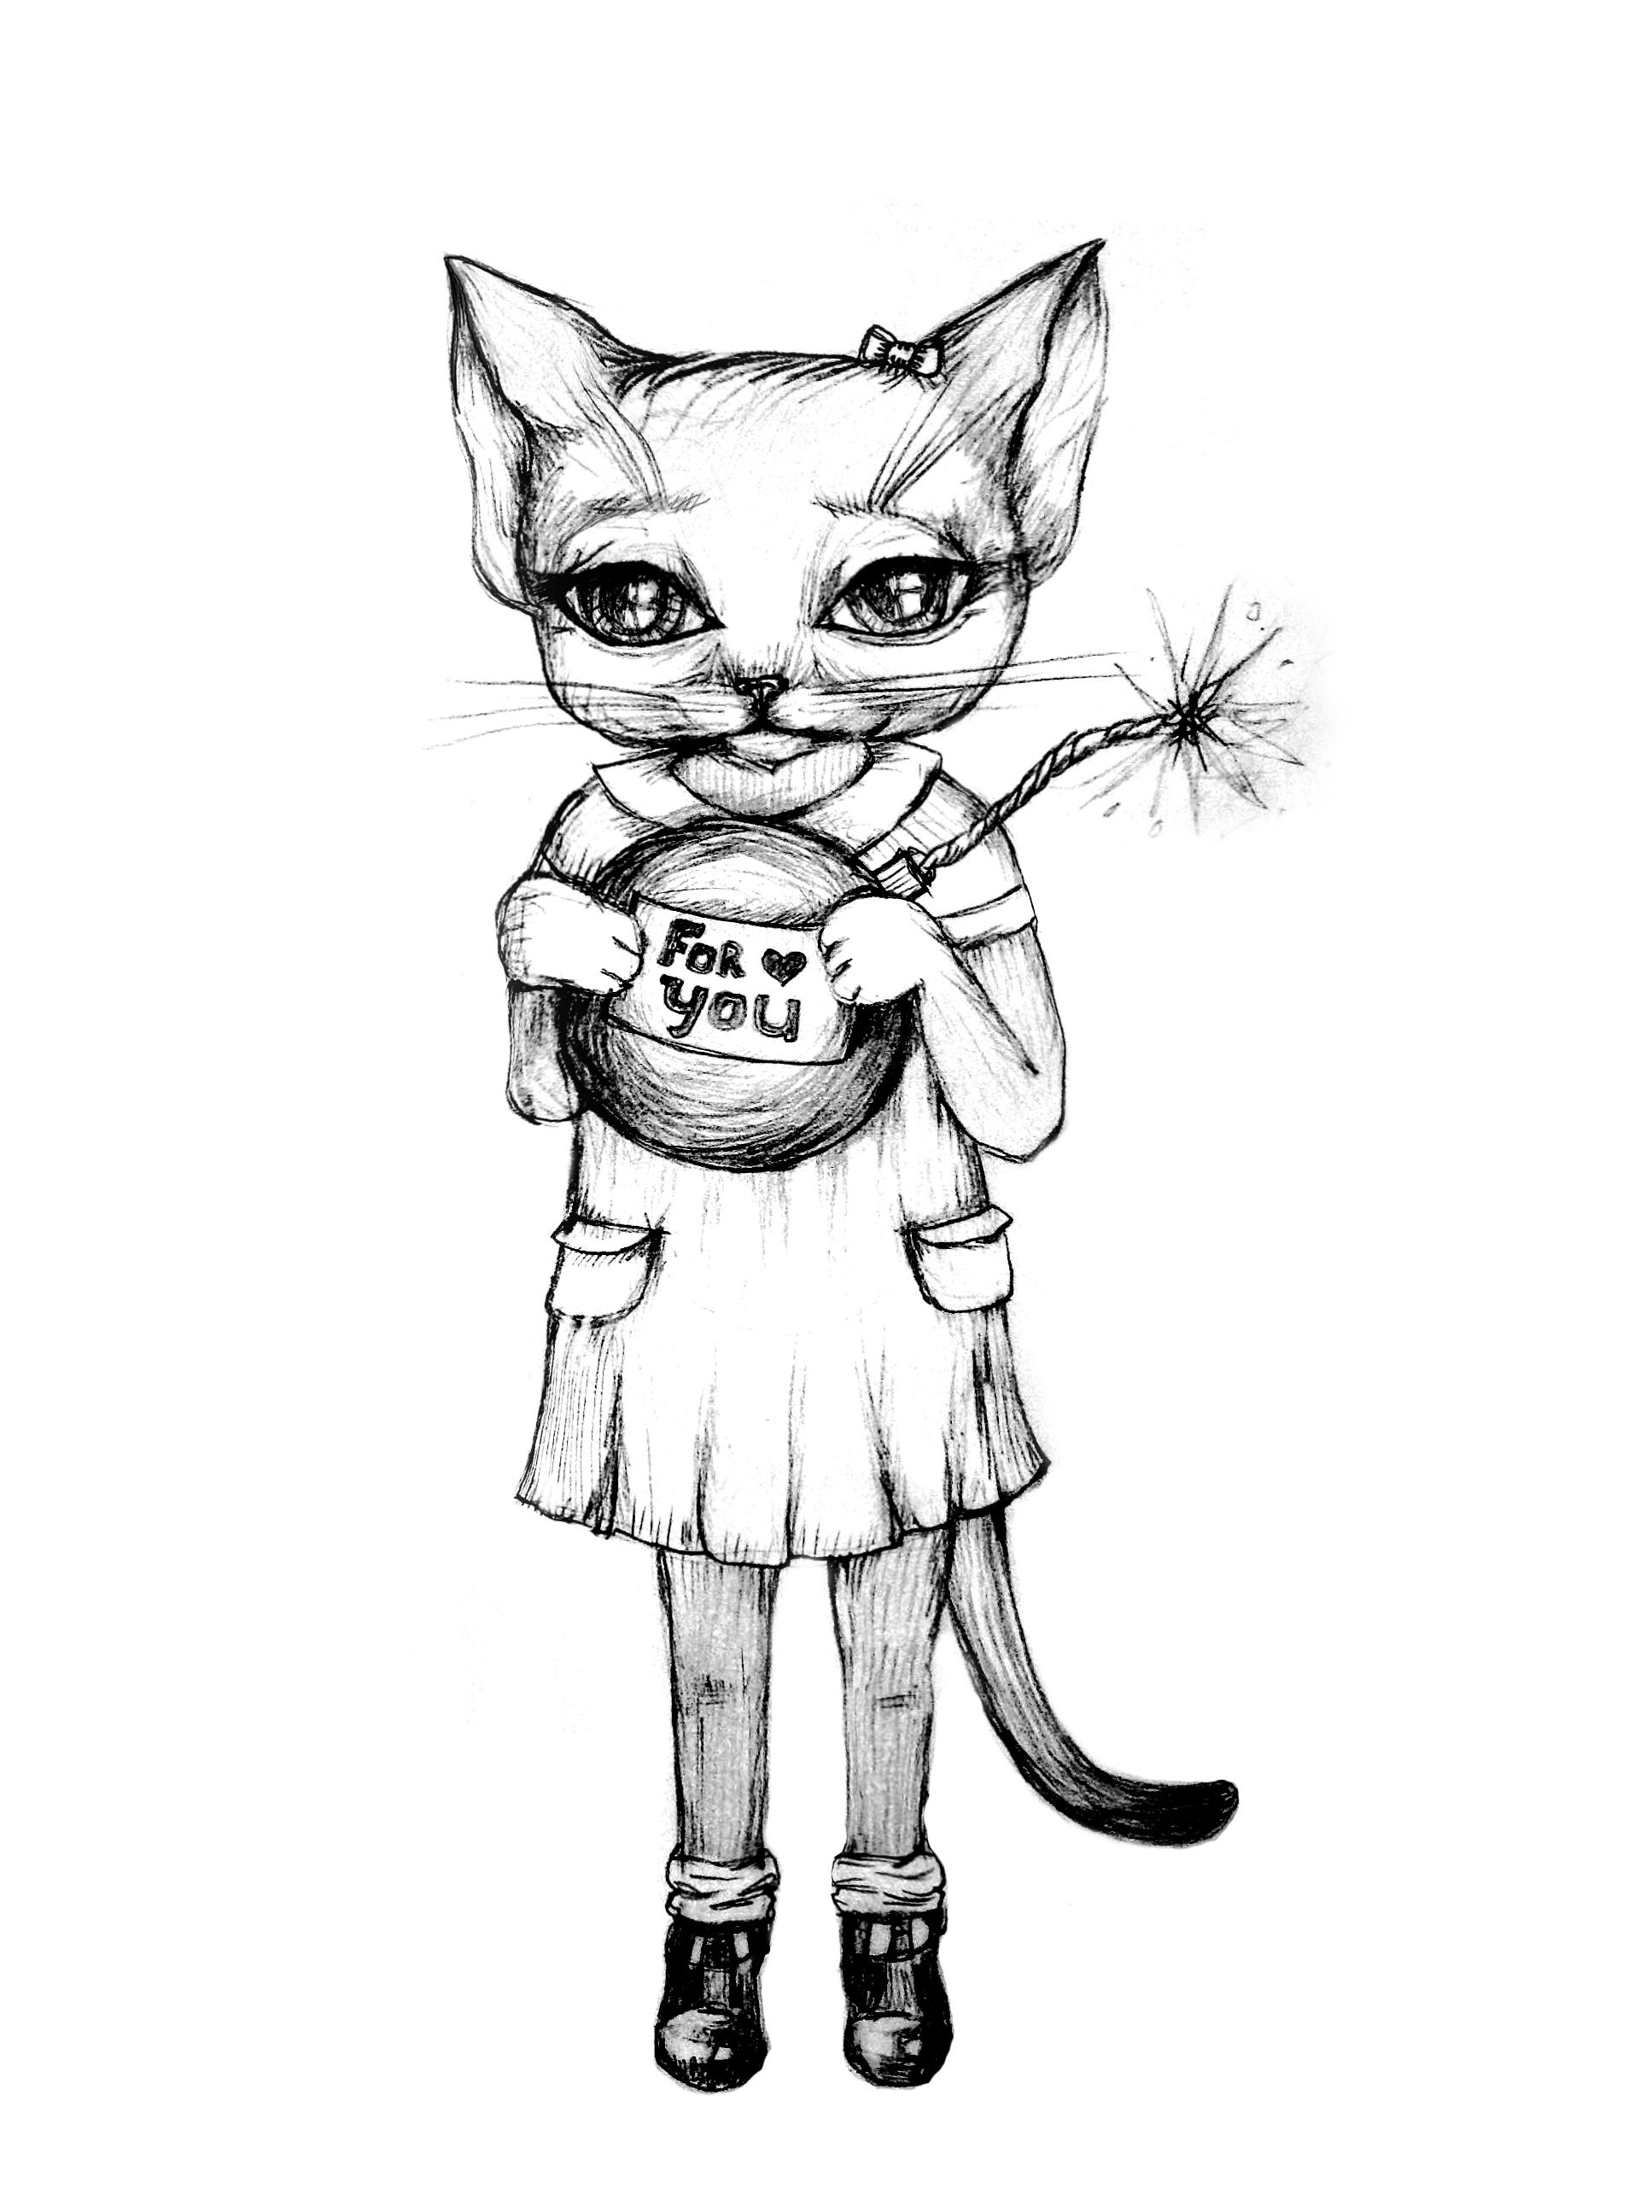 Illustration Courtesy of Shuttersrtock